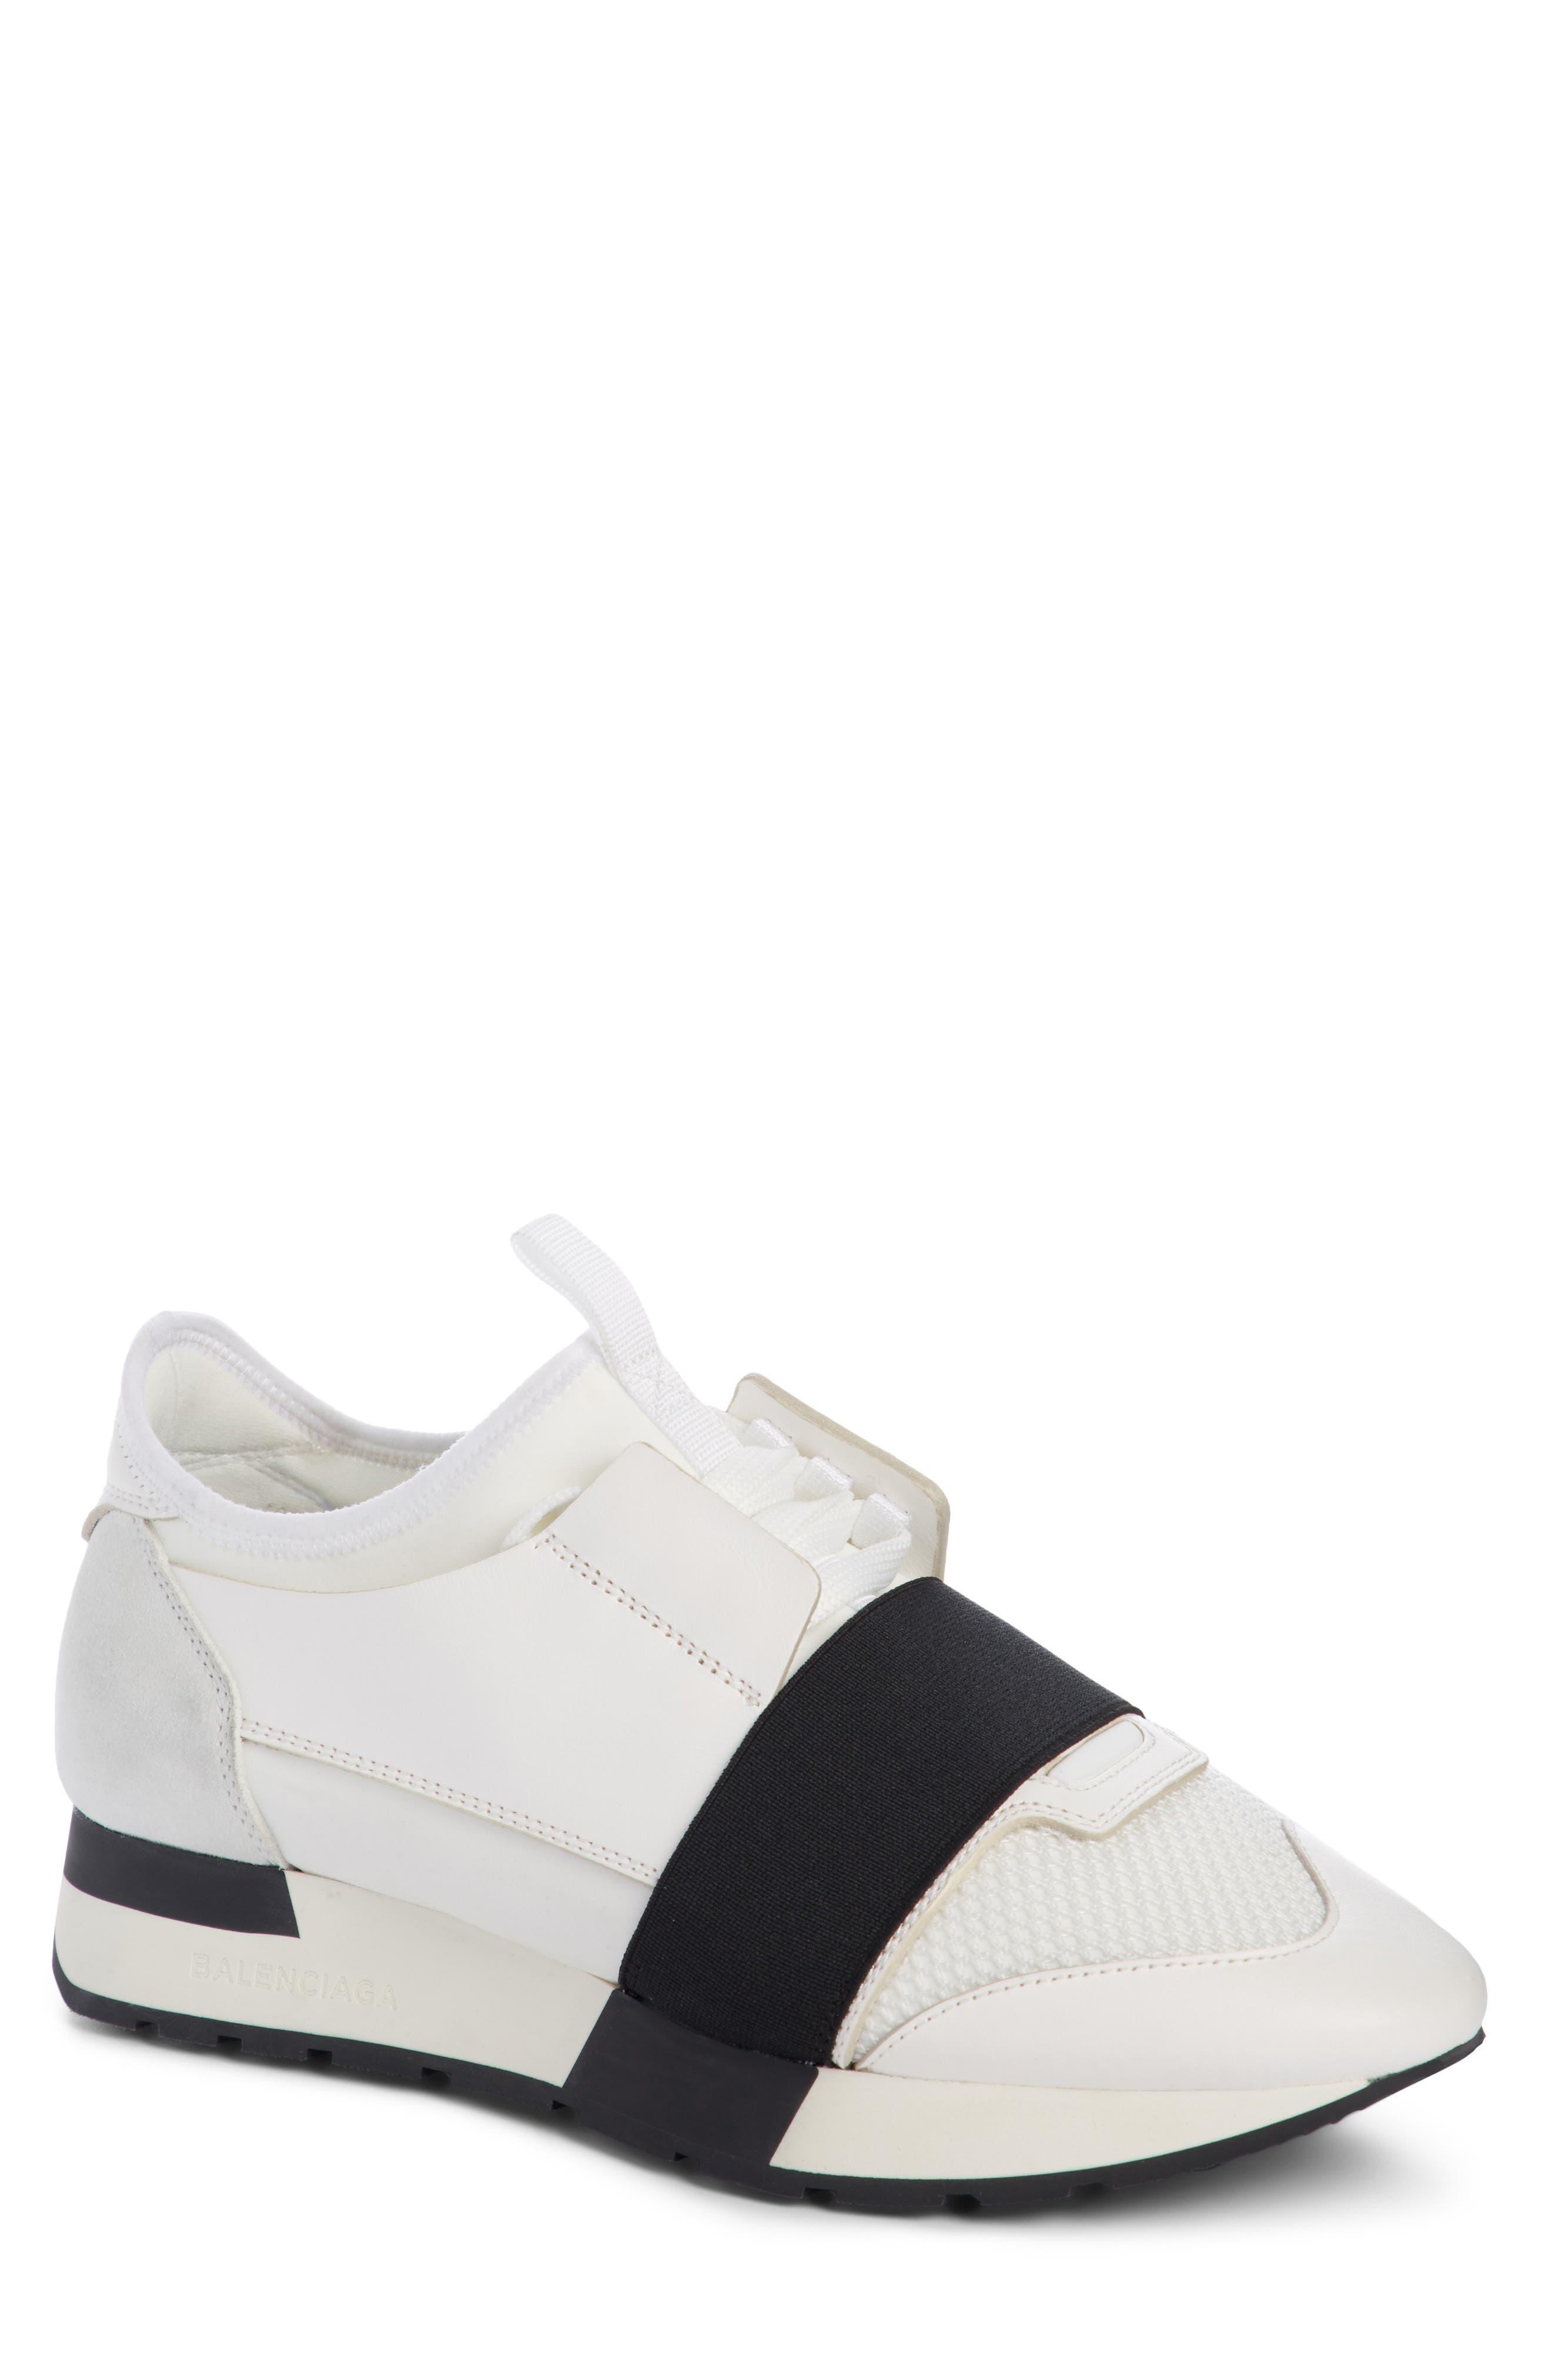 Mixed Media Trainer Sneaker,                             Main thumbnail 1, color,                             White/ Black